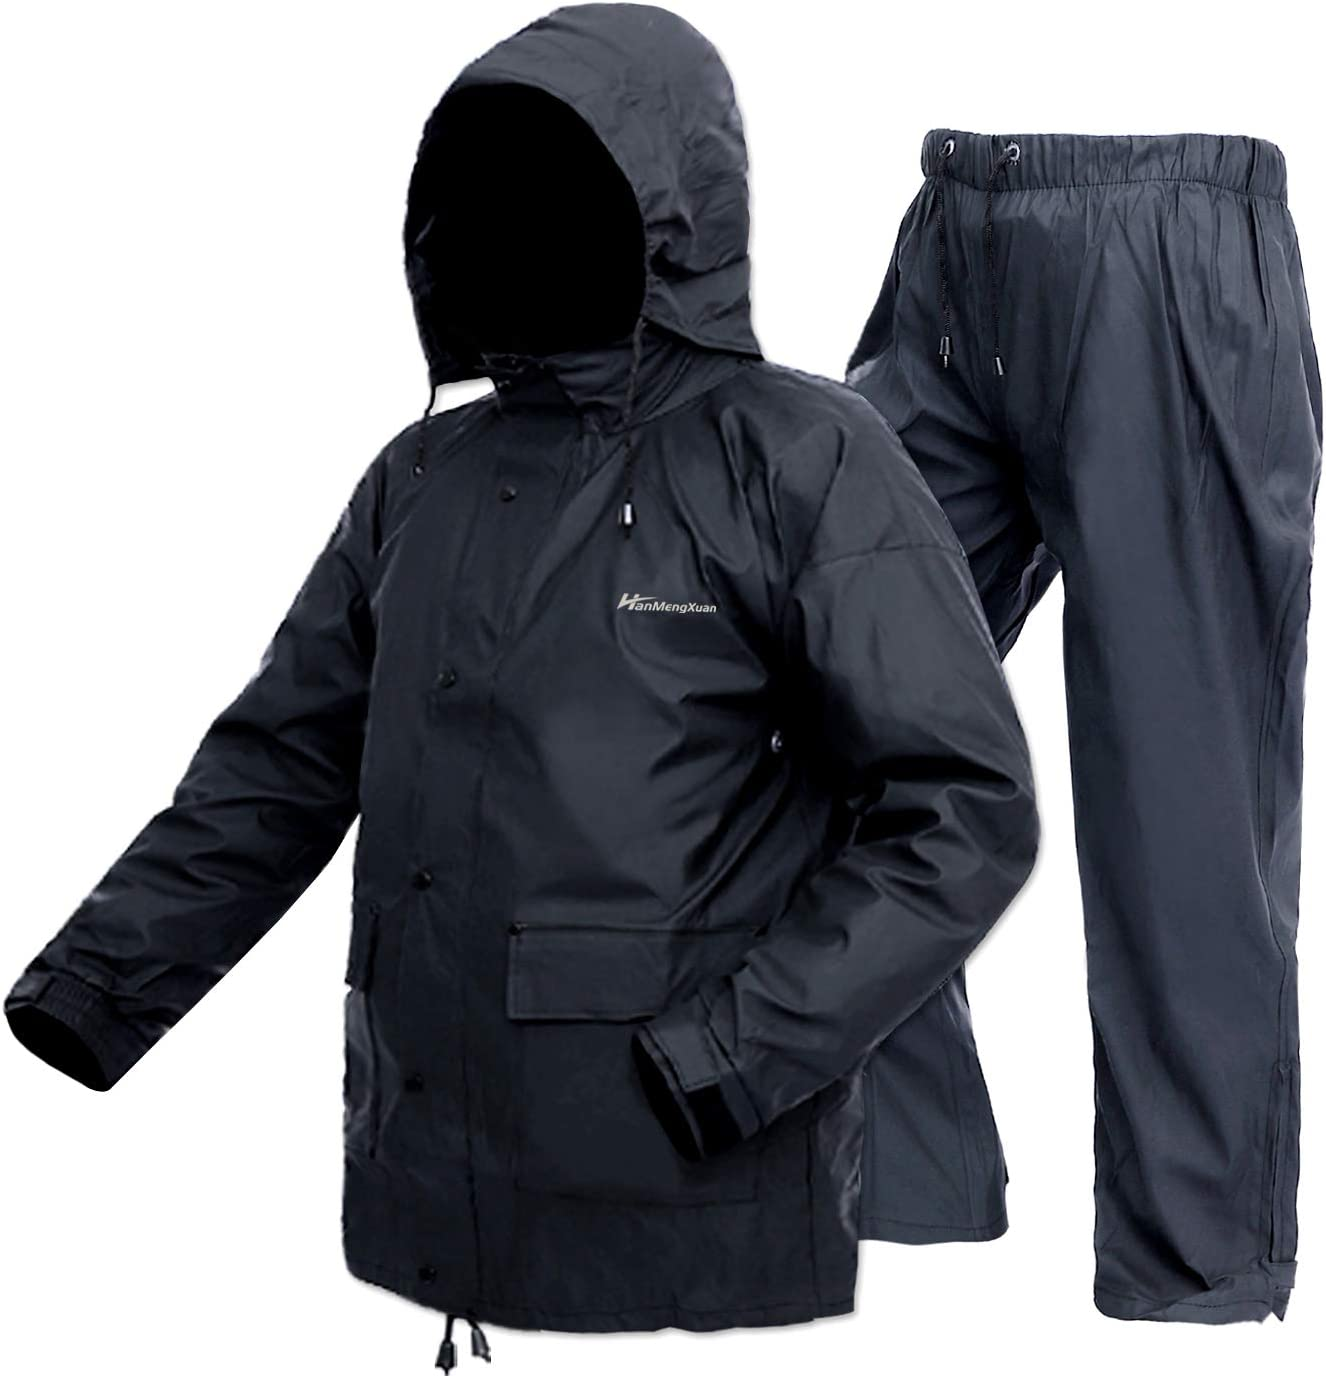 Rain Suits for Mens/Womens Waterproof Lightweight for Work Rain Gear Protective Rainwear Rain Coats (Jacket & Pants)(Small, Black)